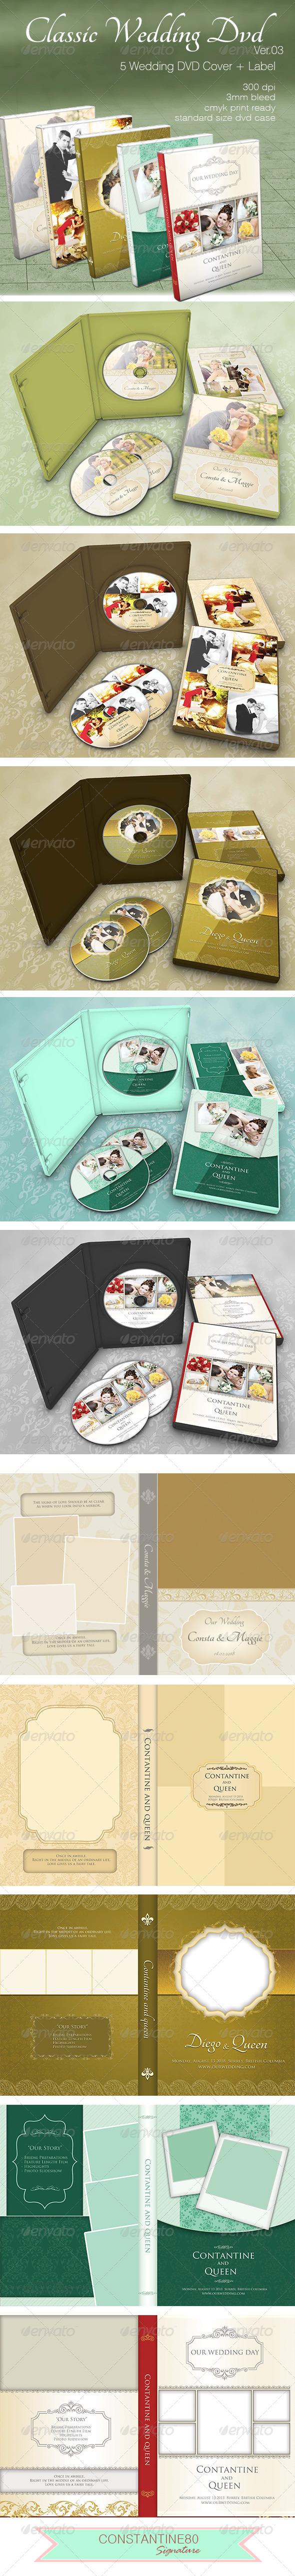 GraphicRiver Classic Wedding Dvd ver03 5124864